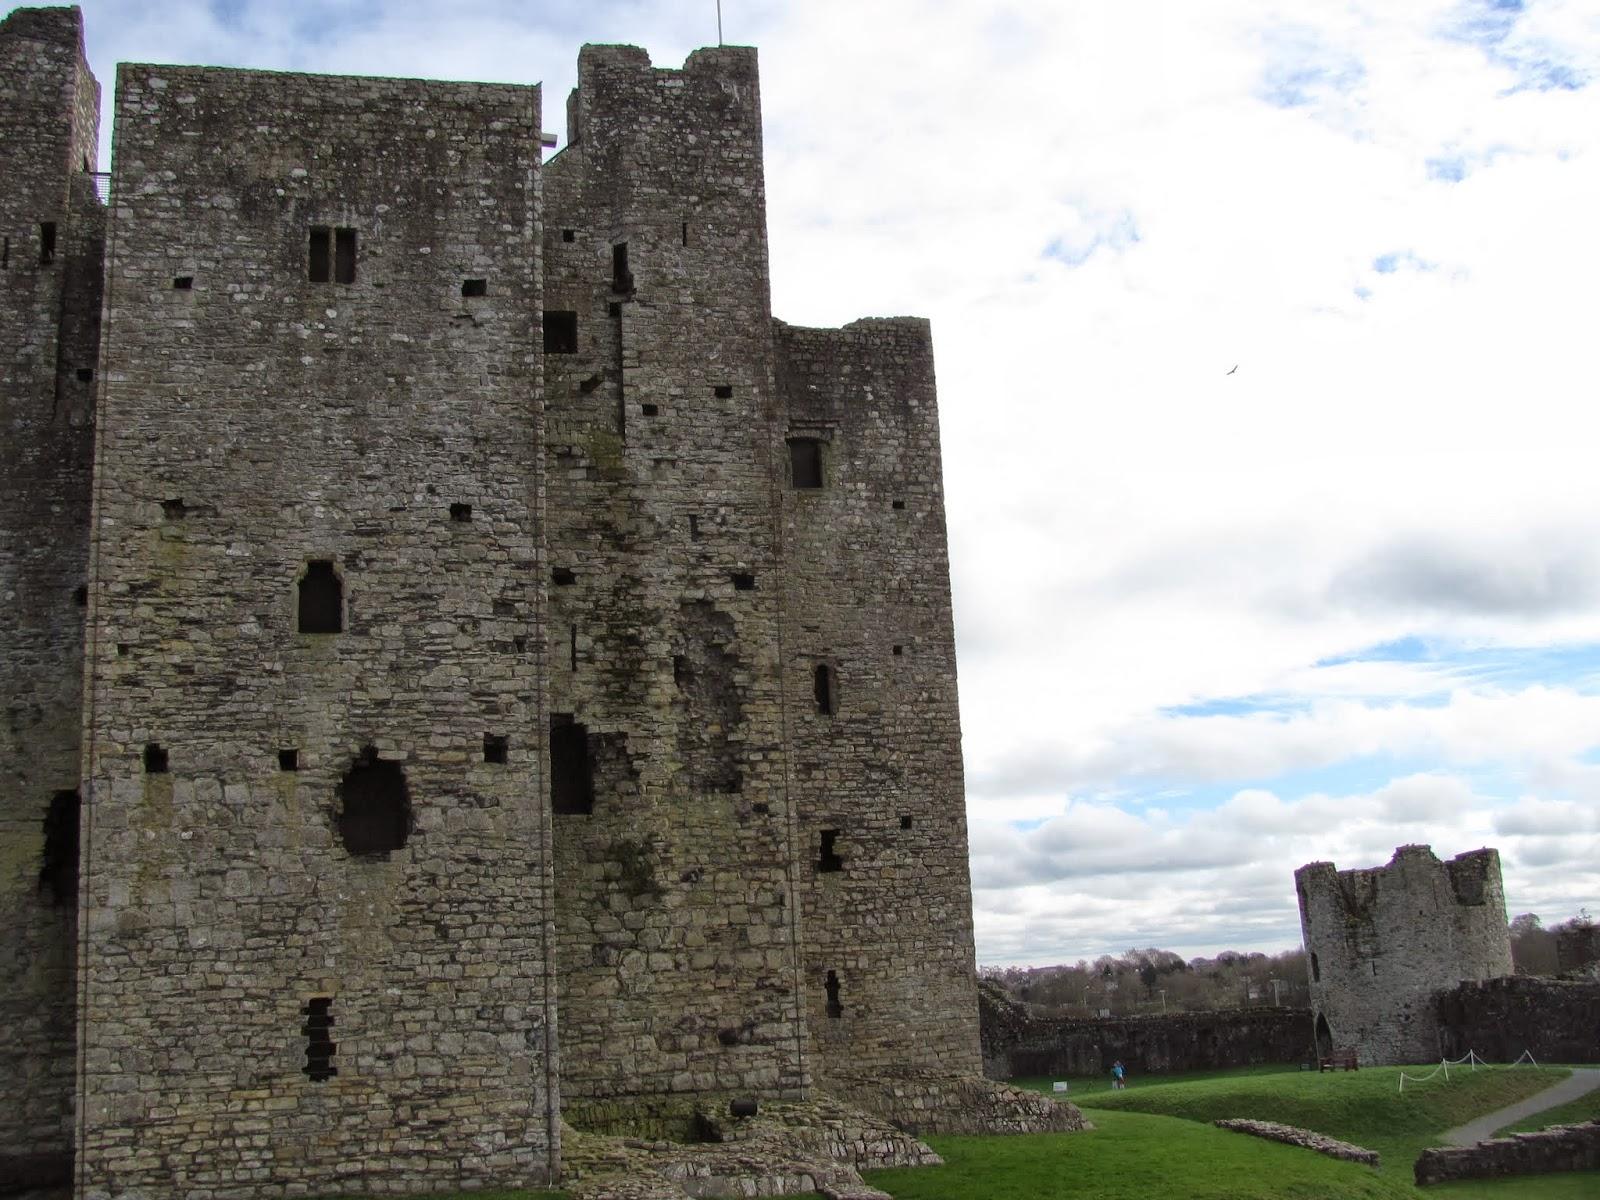 Angled Batter Walls at Trim Castle, Trim, Ireland